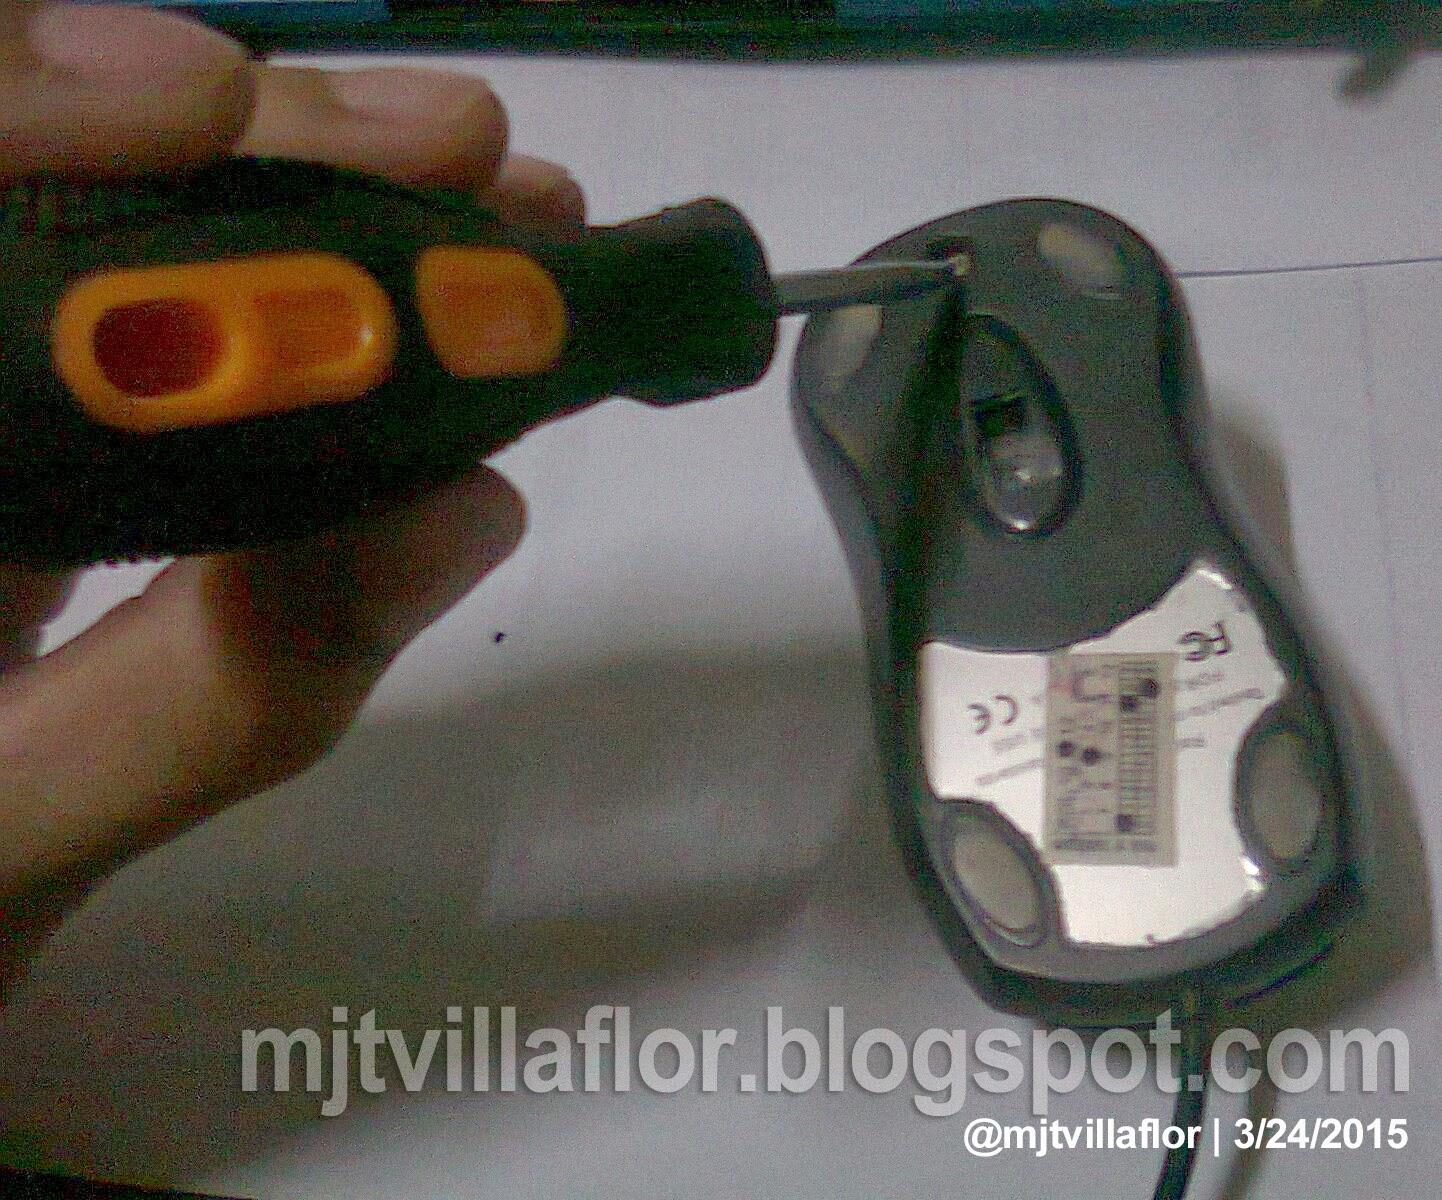 Troubleshooting: USB Mouse Wiring - @mjtvillaflor